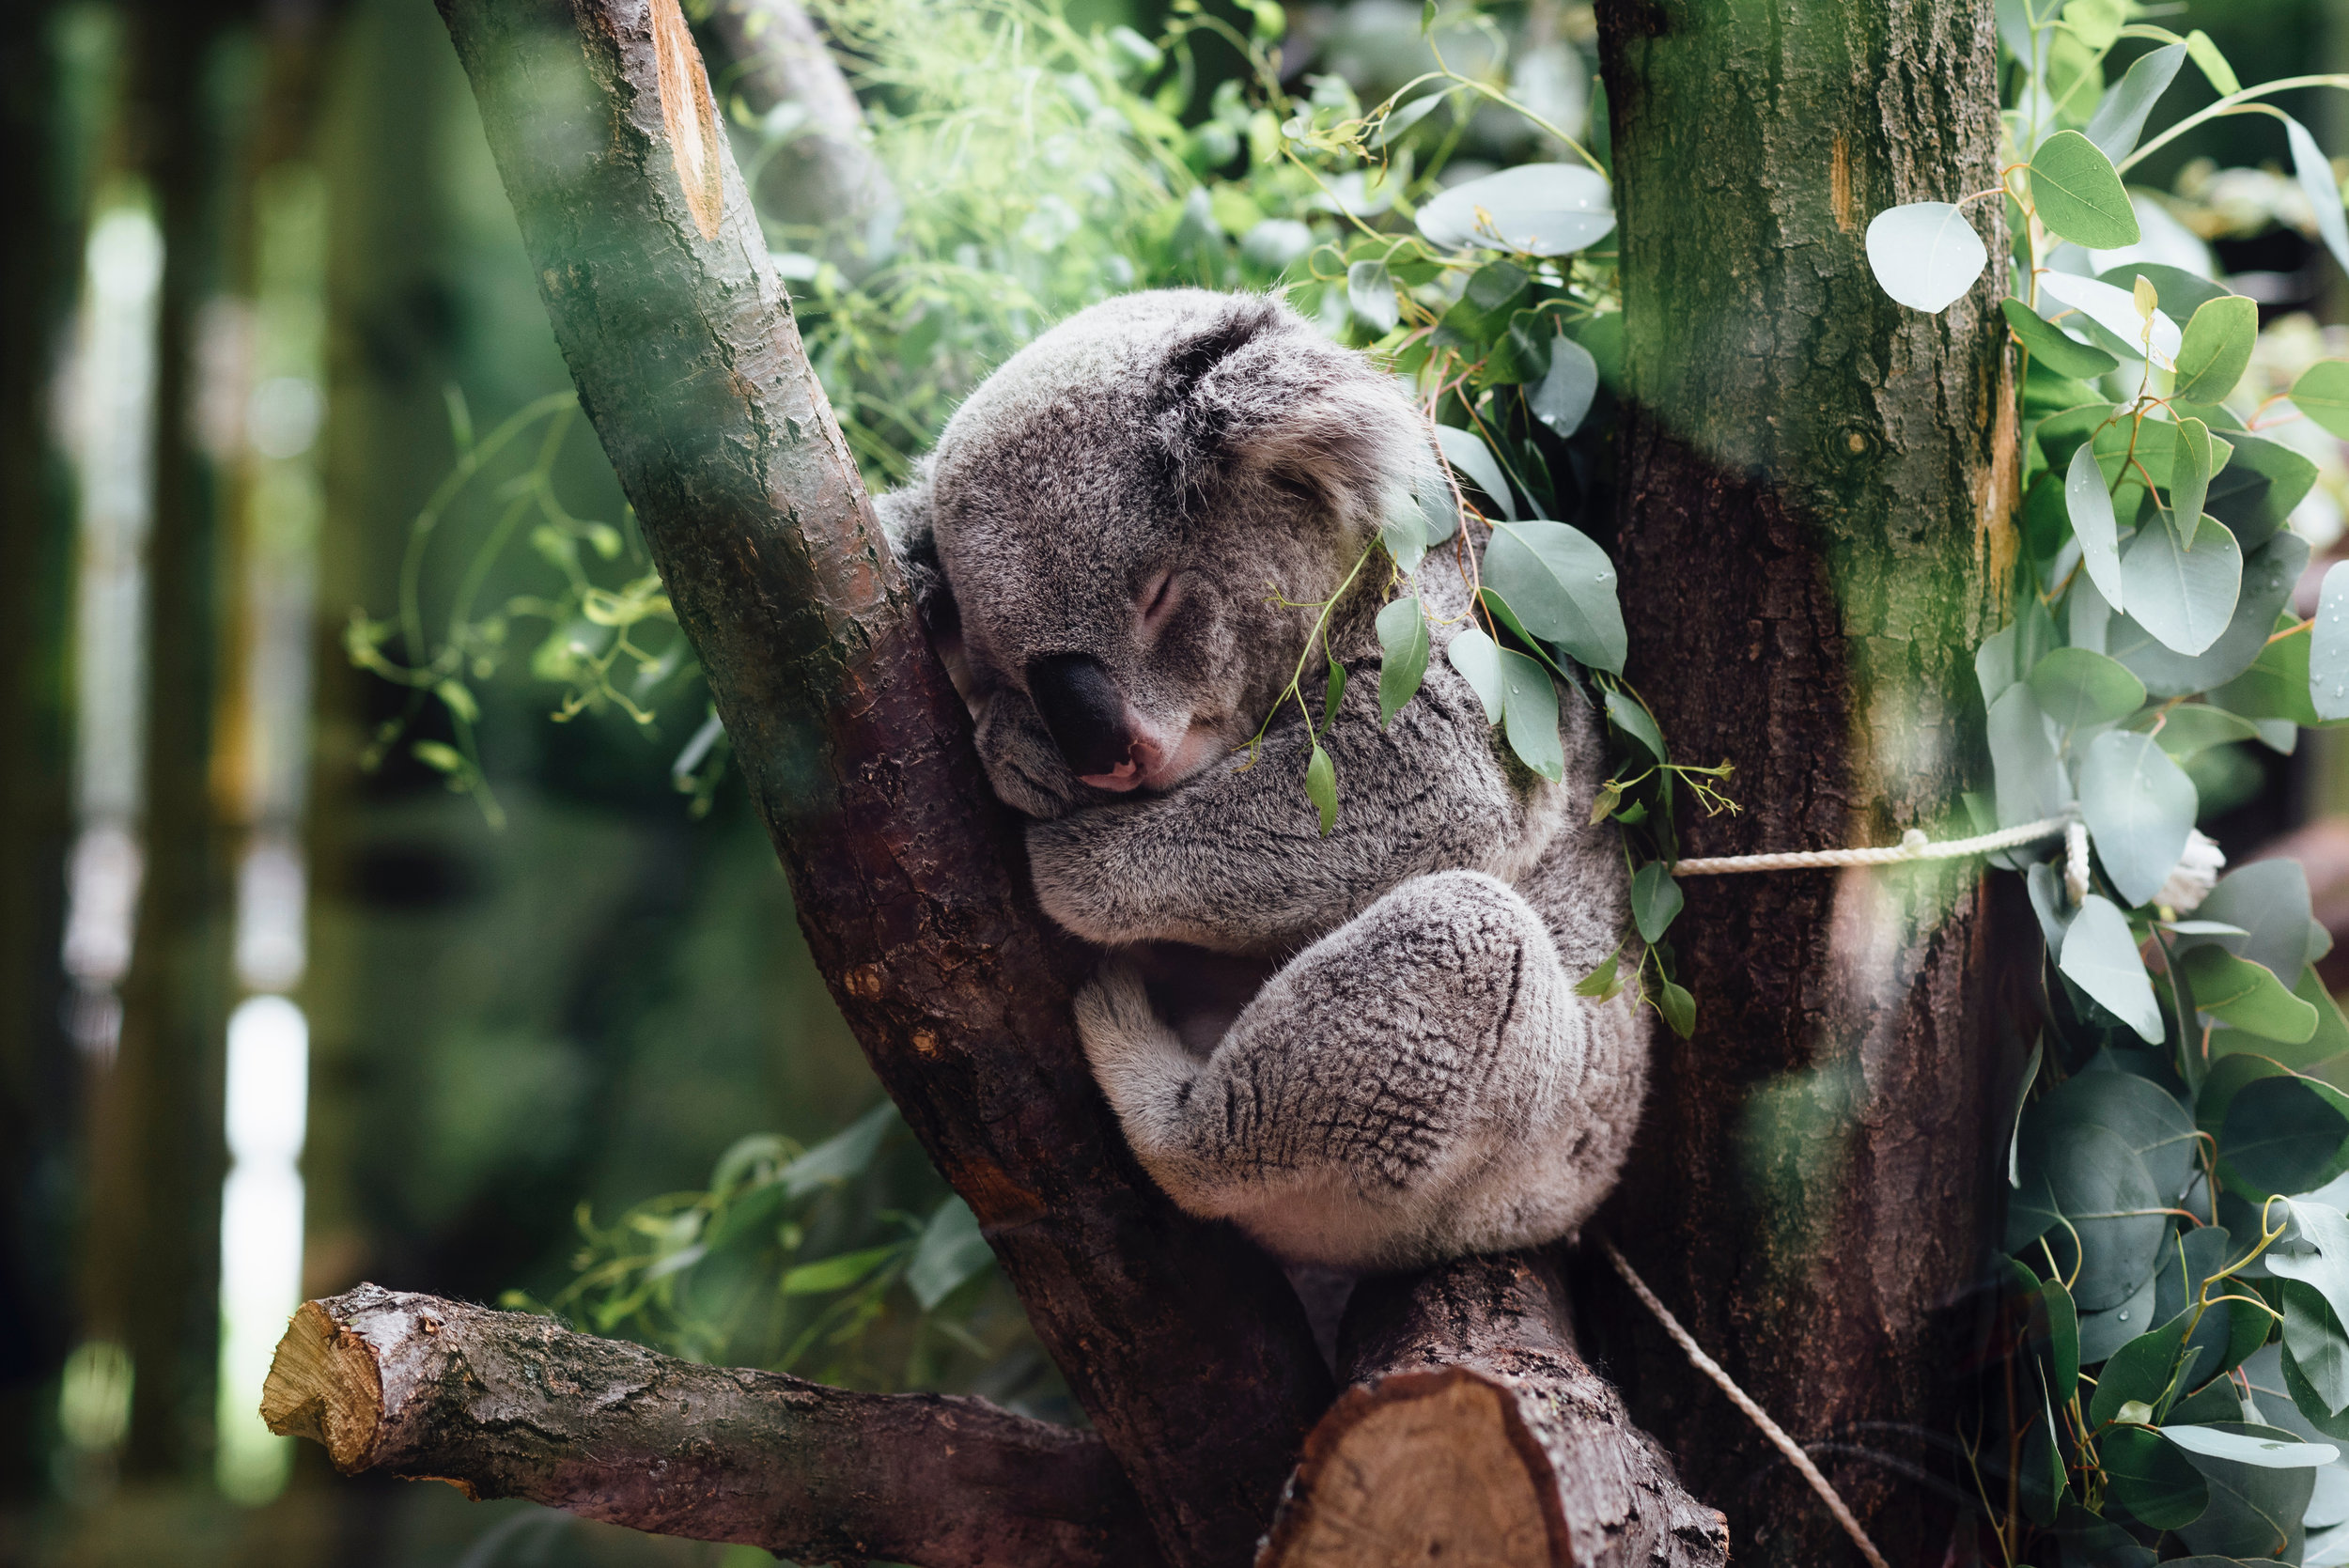 Australia koala - Jordan Whitt